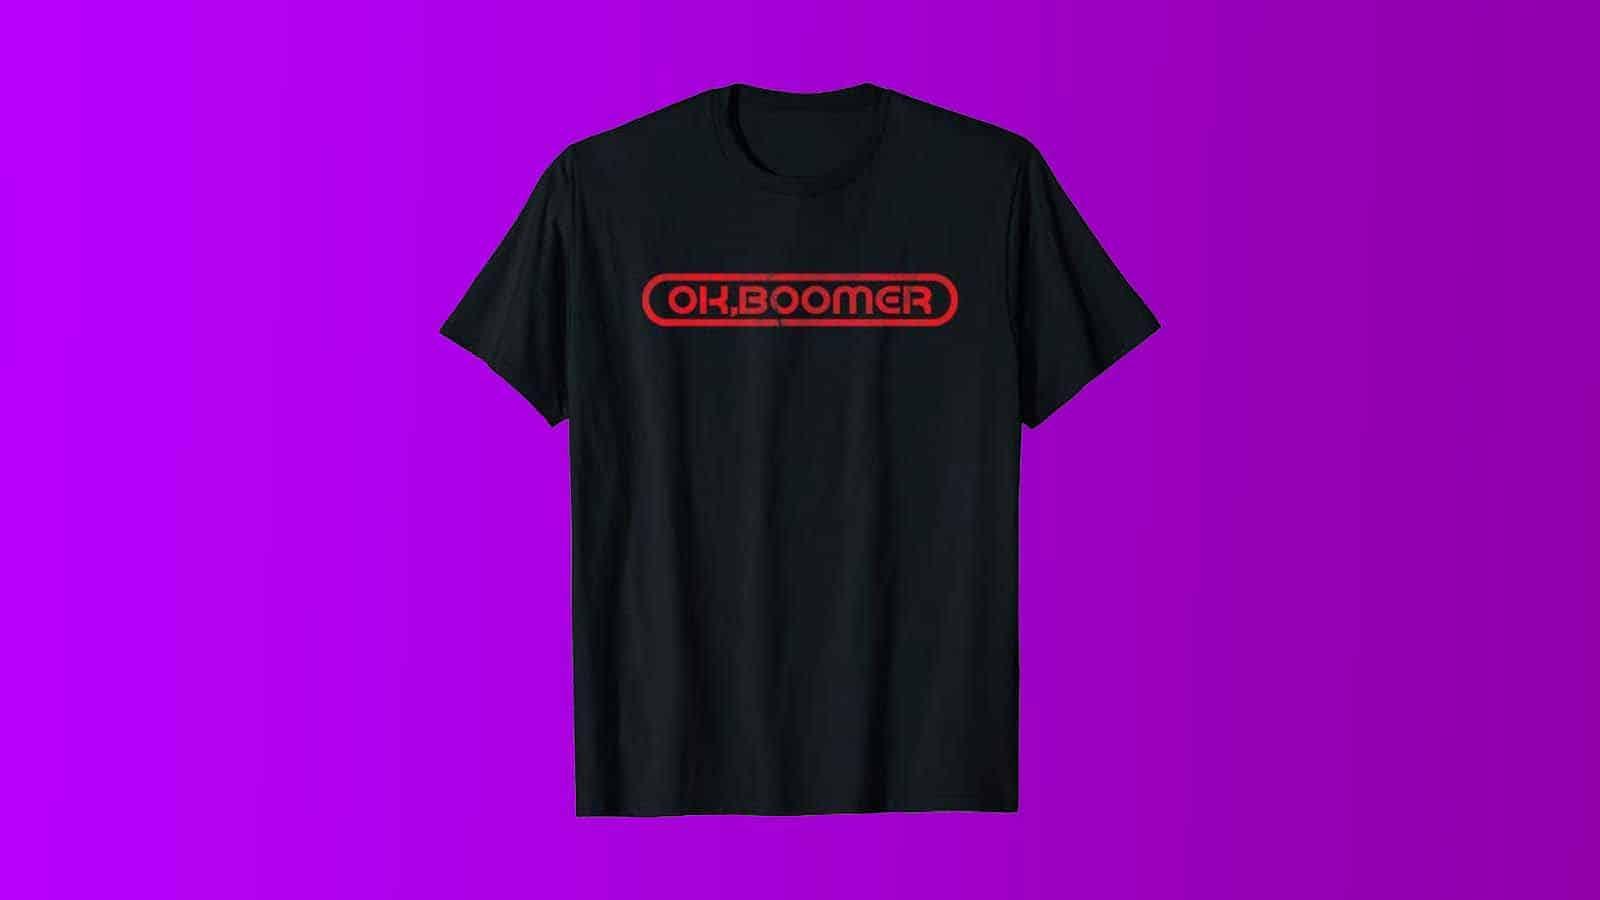 ok boomer tshirt